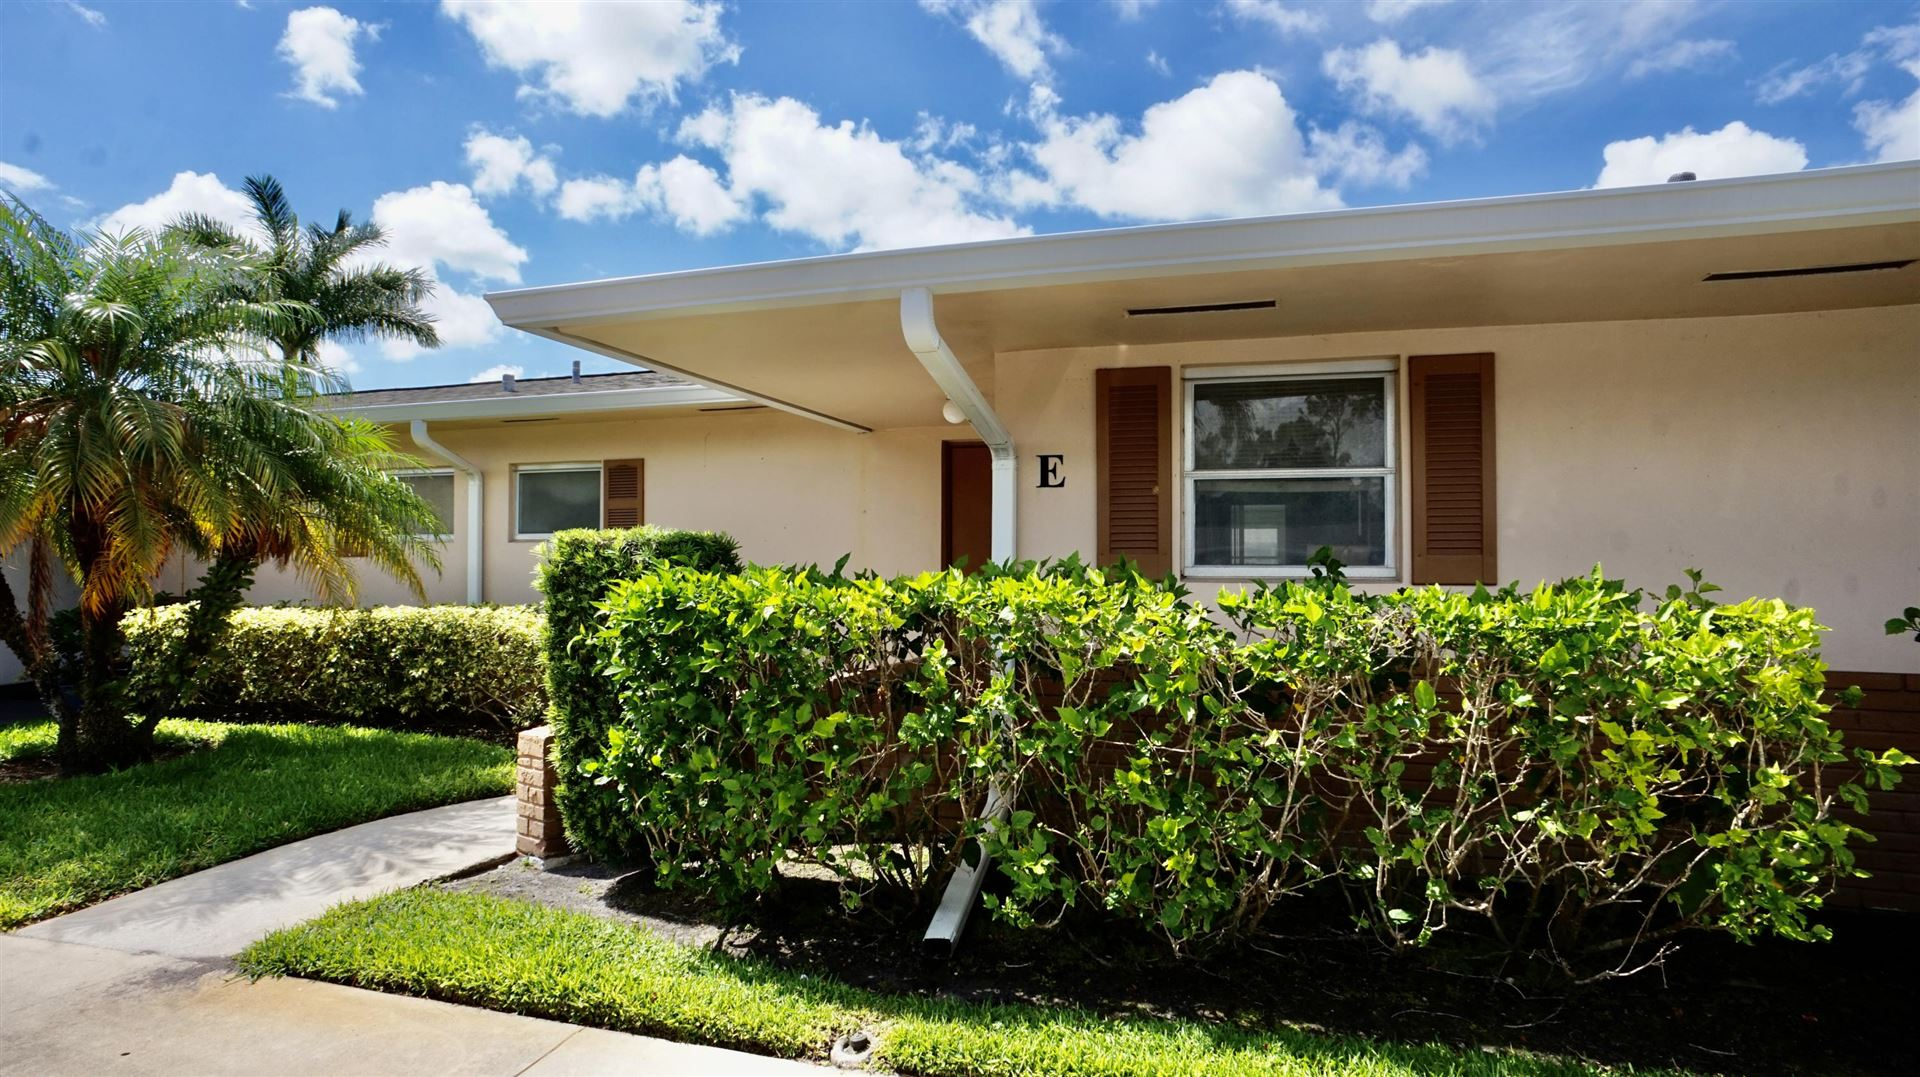 2545 Dudley Drive W #E, West Palm Beach, FL 33415 - MLS#: RX-10715883